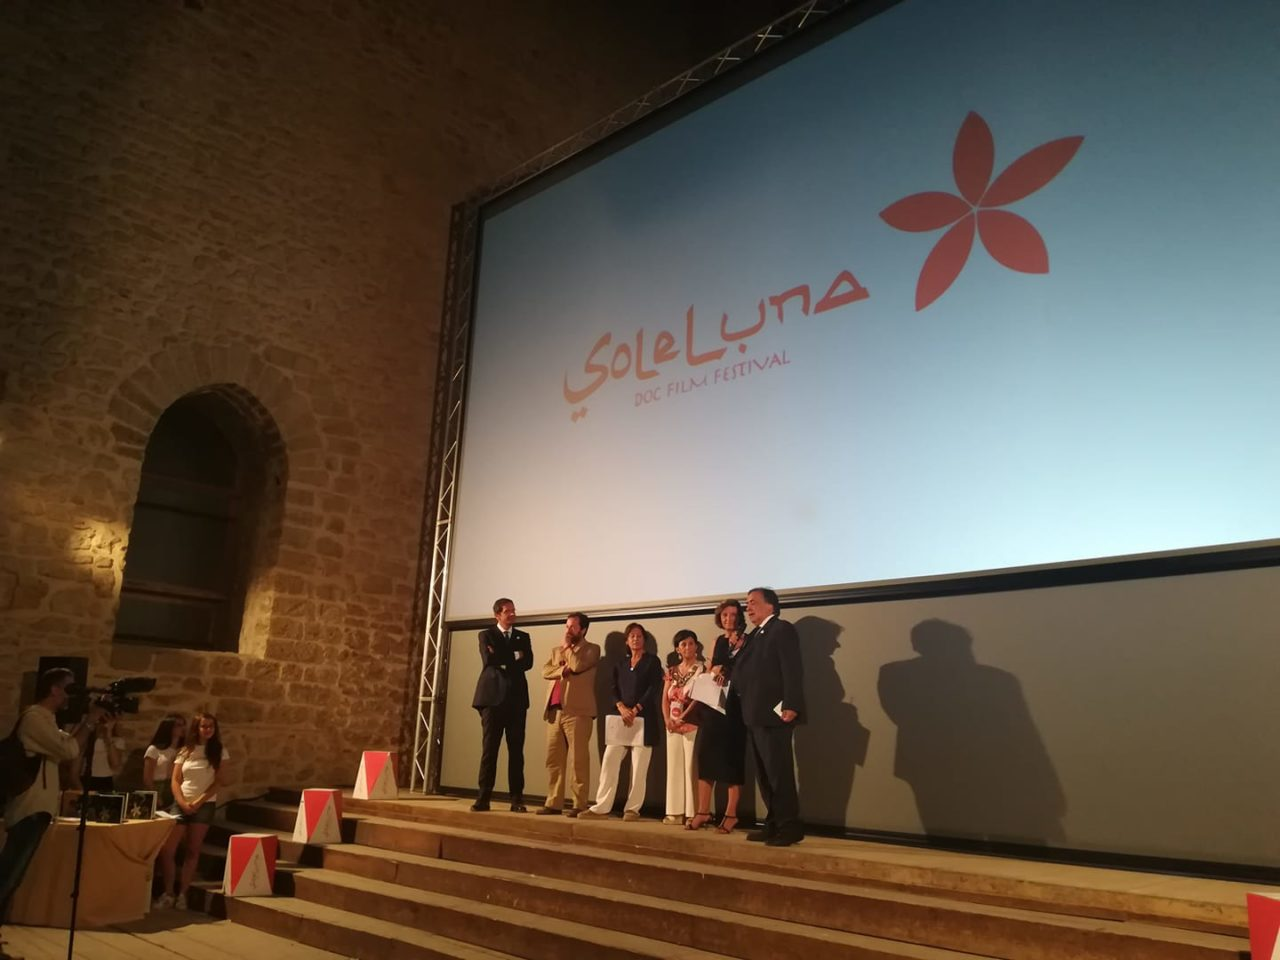 solo palermo festival film oceneni gnomon ceska televize